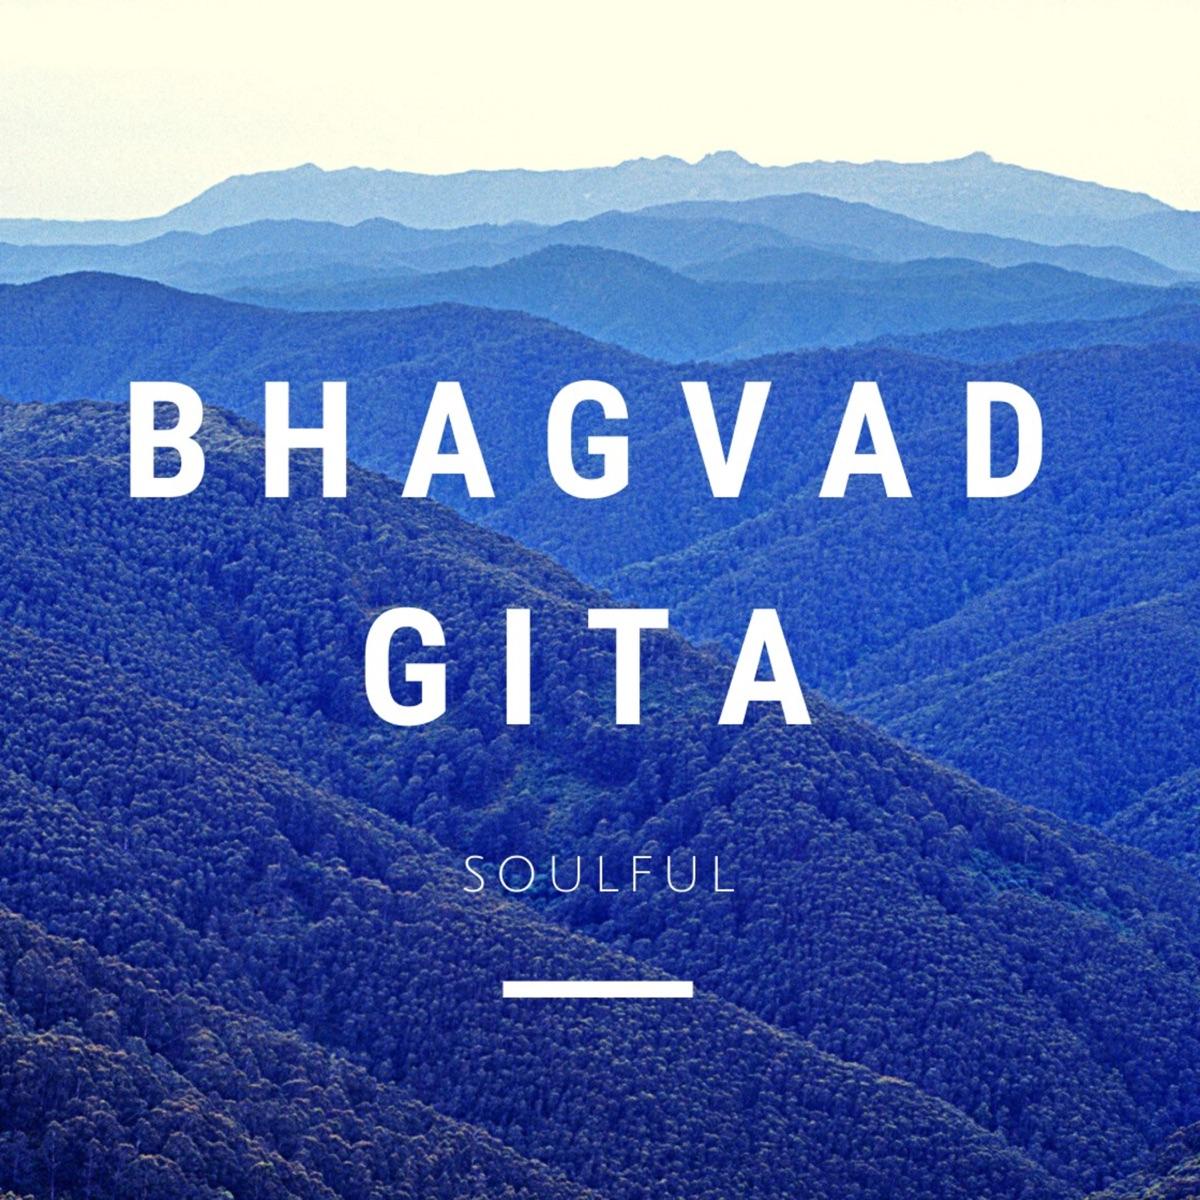 Bhagavad Gita Soulful